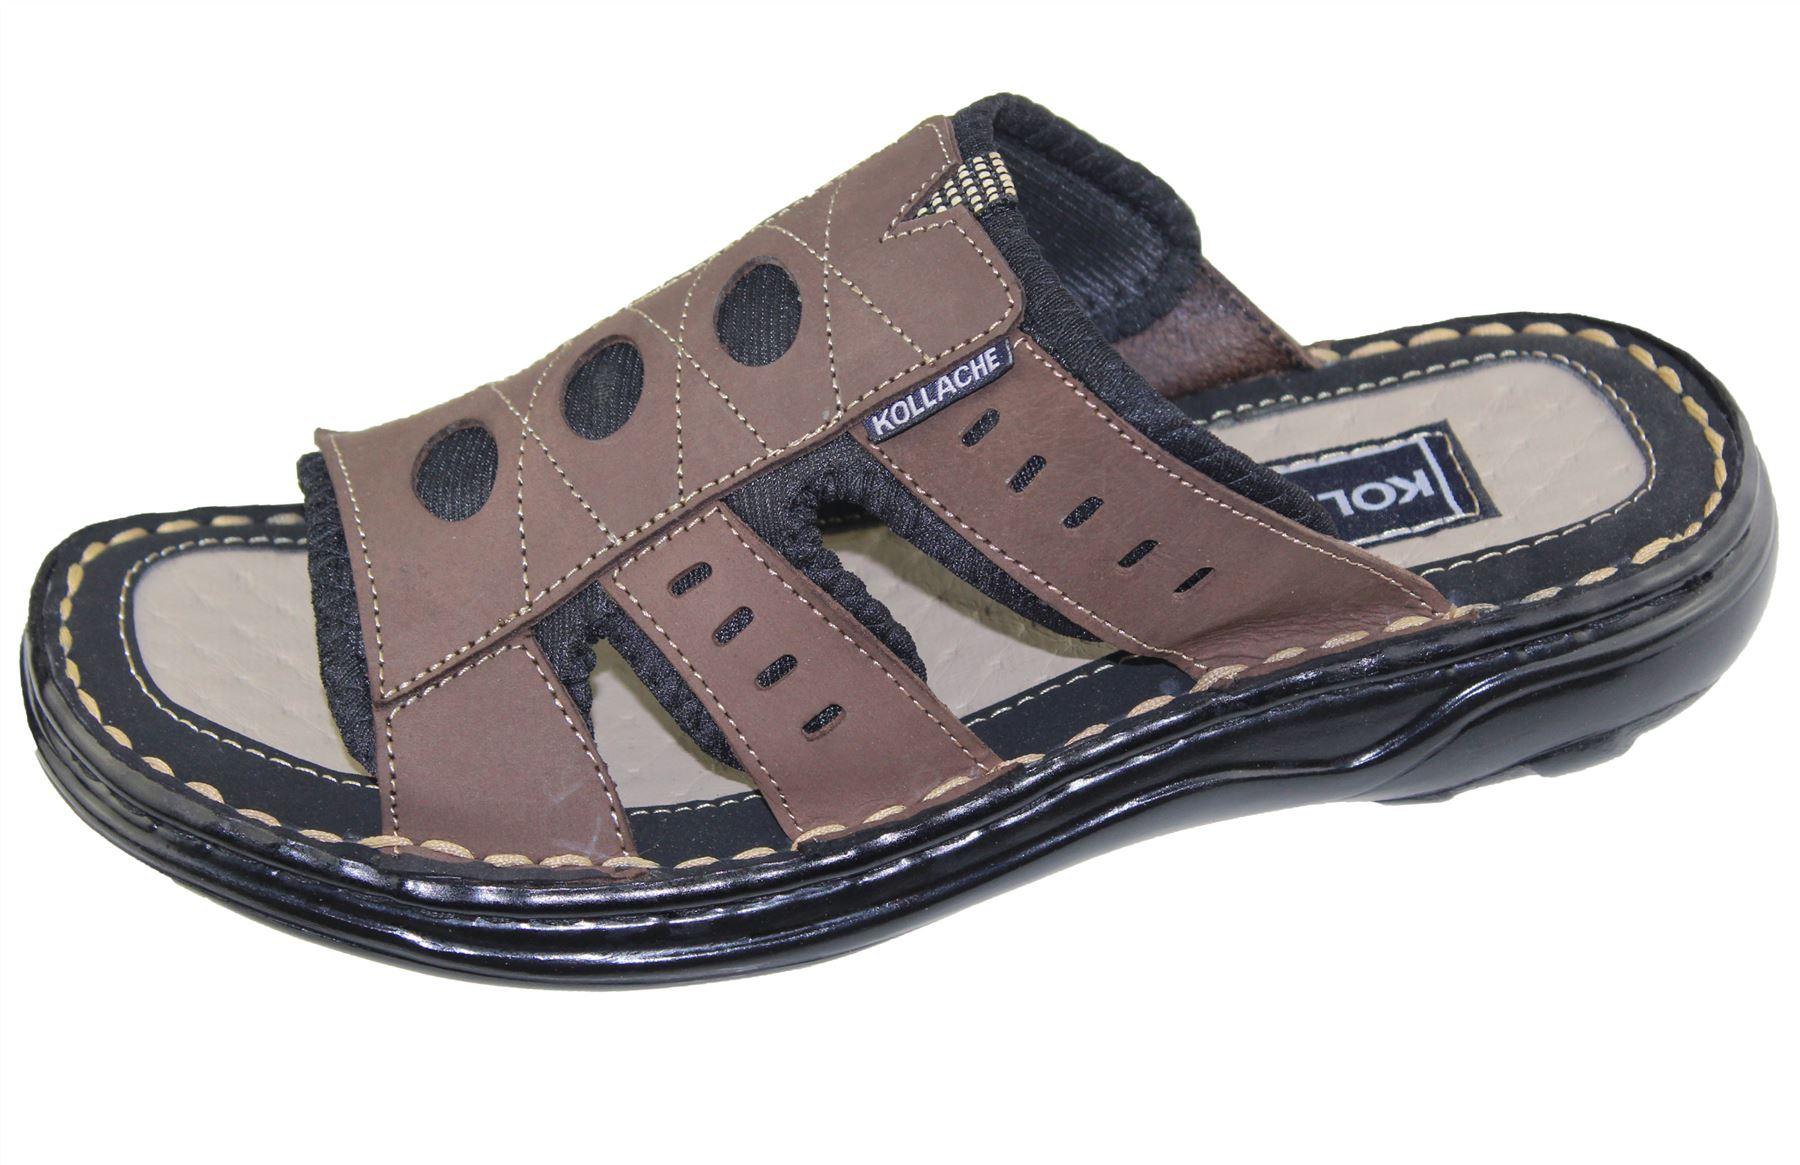 Mens-Slipper-Sandal-Sports-Beach-Buckle-Walking-Fashion-Summer-Casual-Shoes-Size miniatura 25